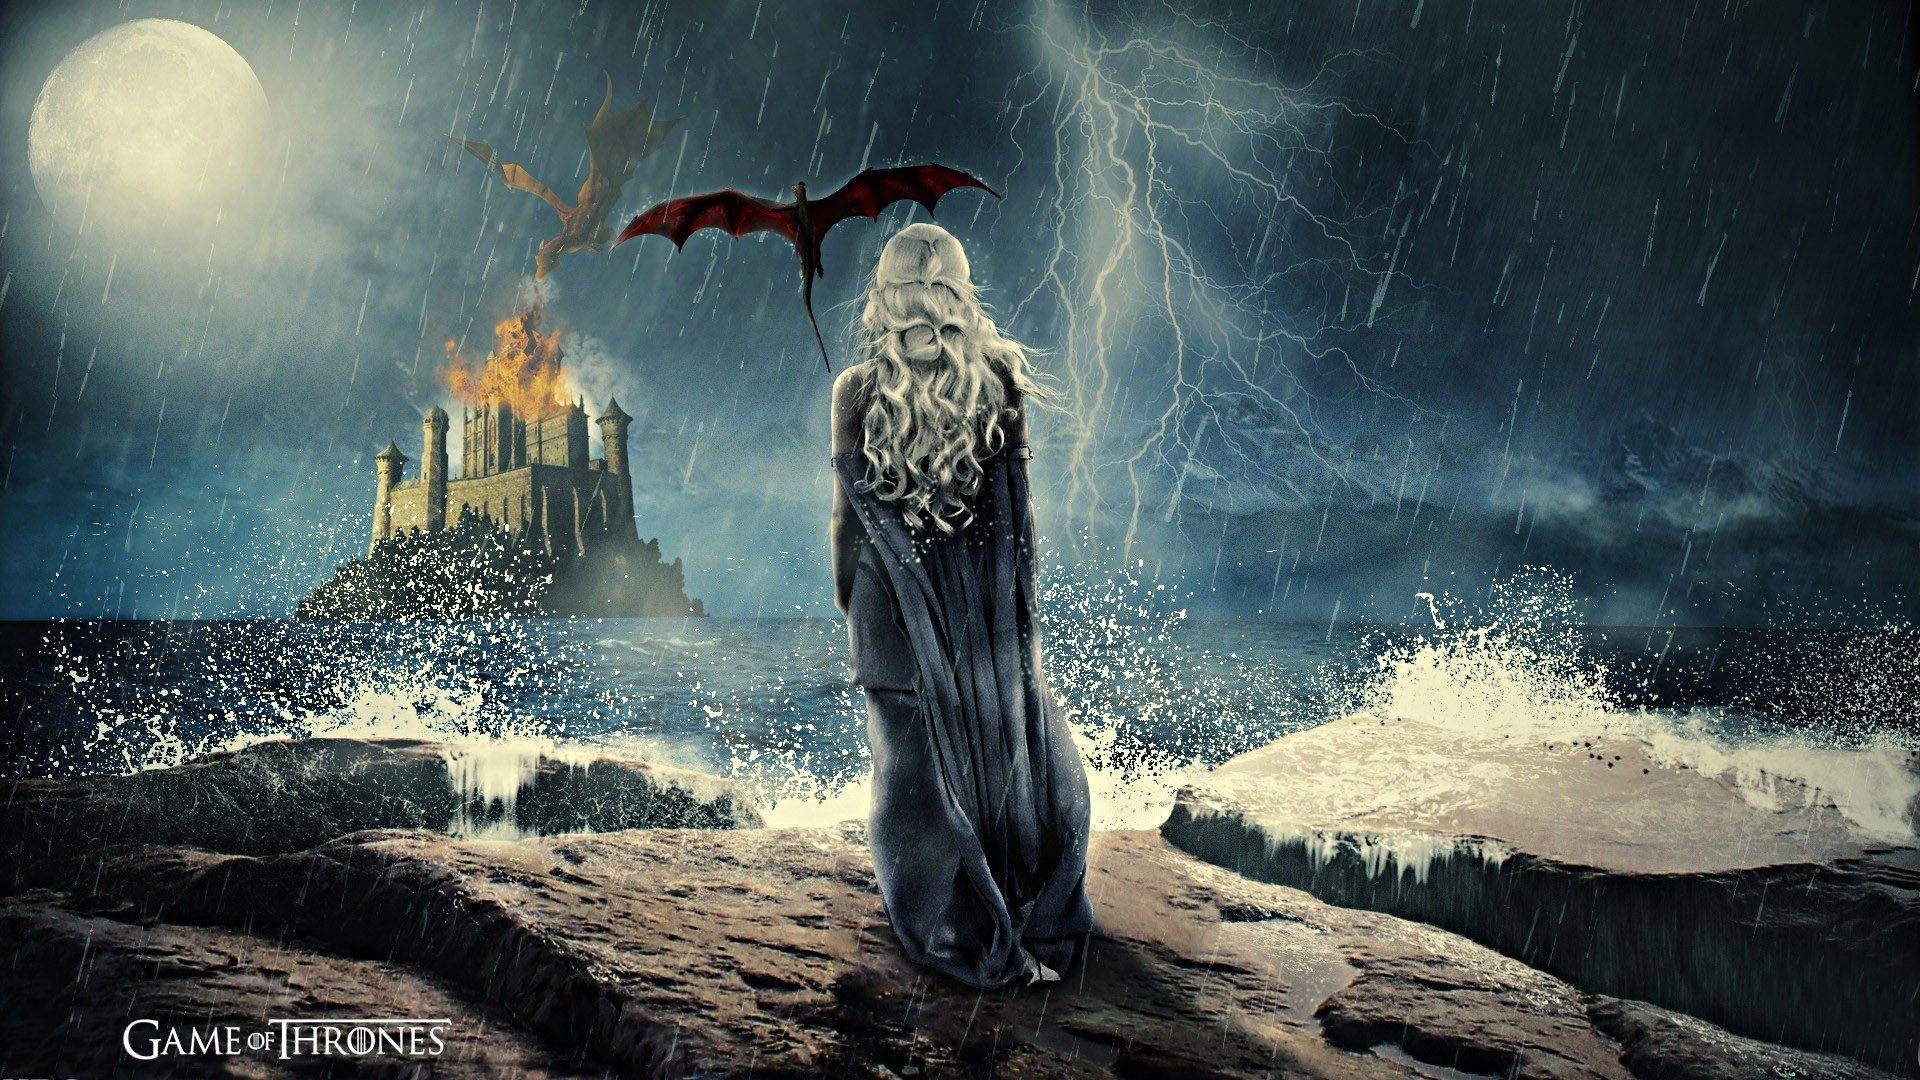 Game Of Thrones Desktop Wallpaper 1920x1080 Game Of Throne Wallpaper